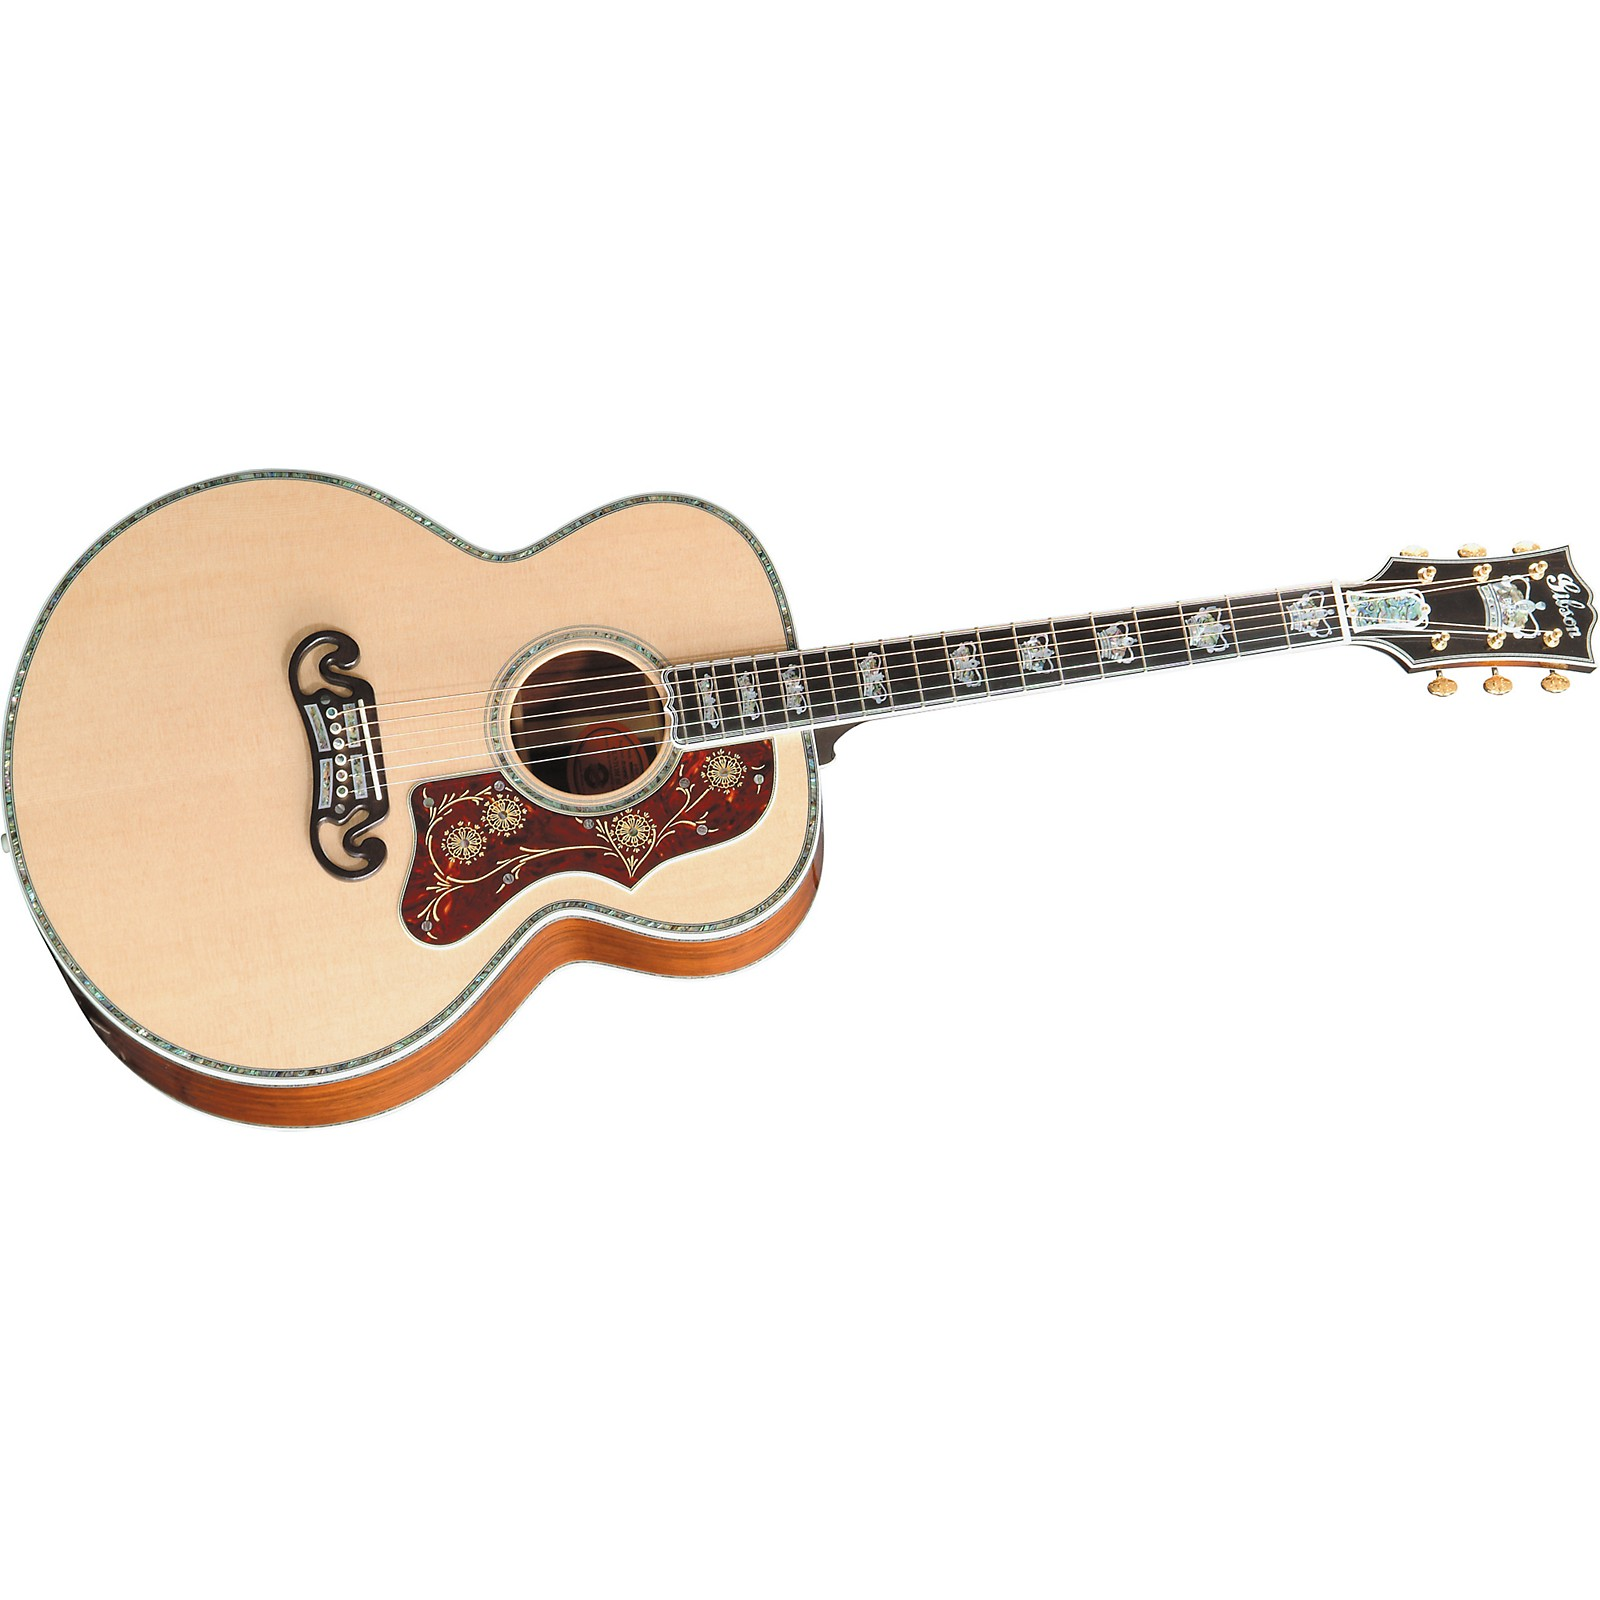 Gibson J-250 Monarch Acoustic Guitar